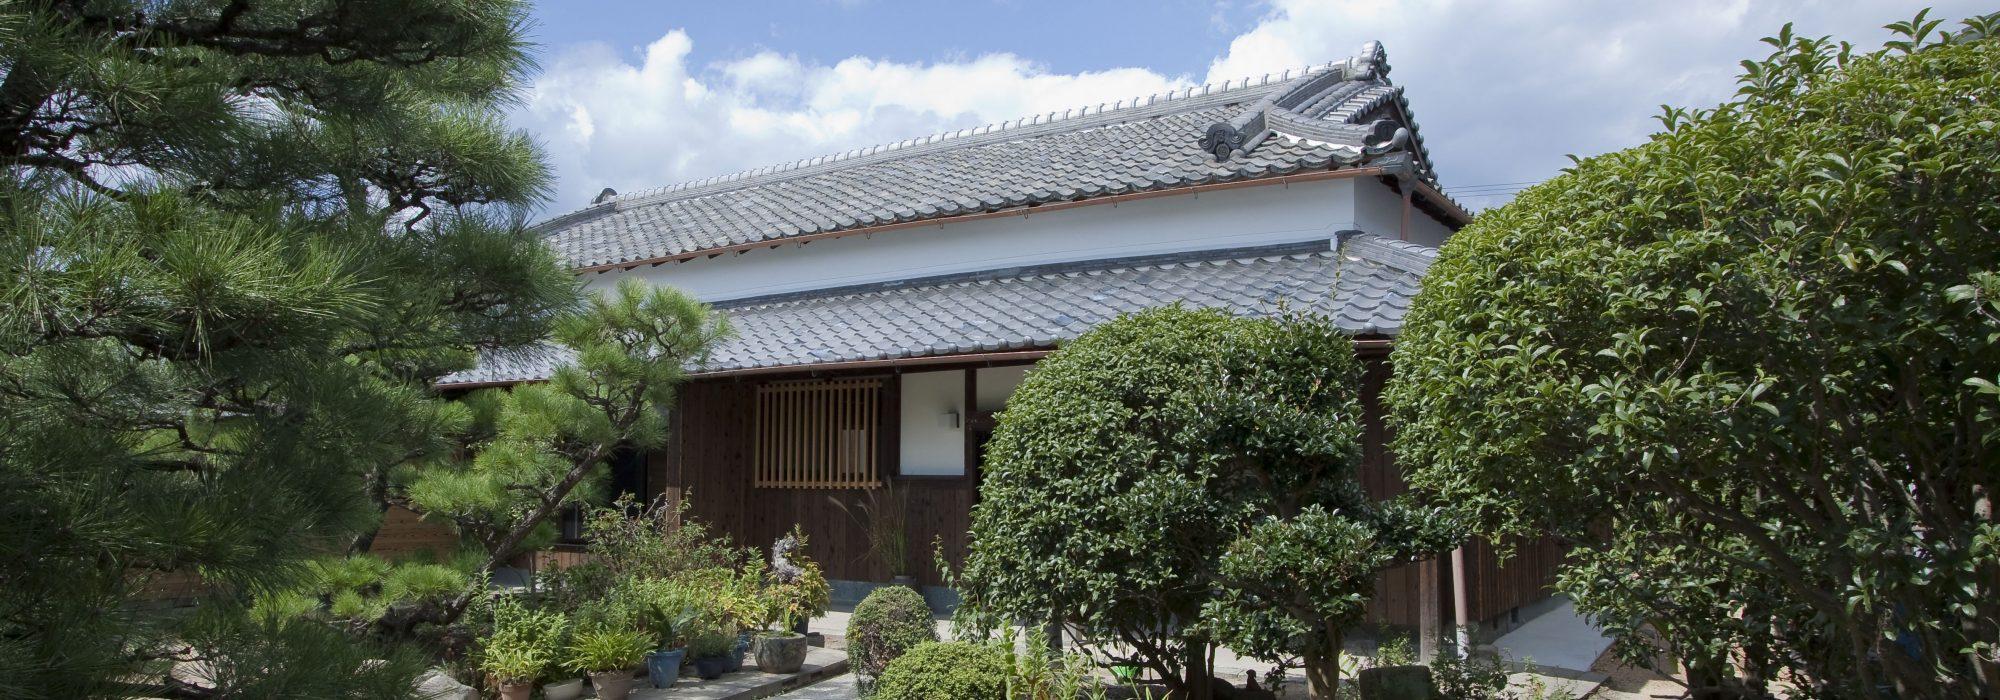 輝建設 大阪・奈良で新築・古民家再生する東大阪の工務店